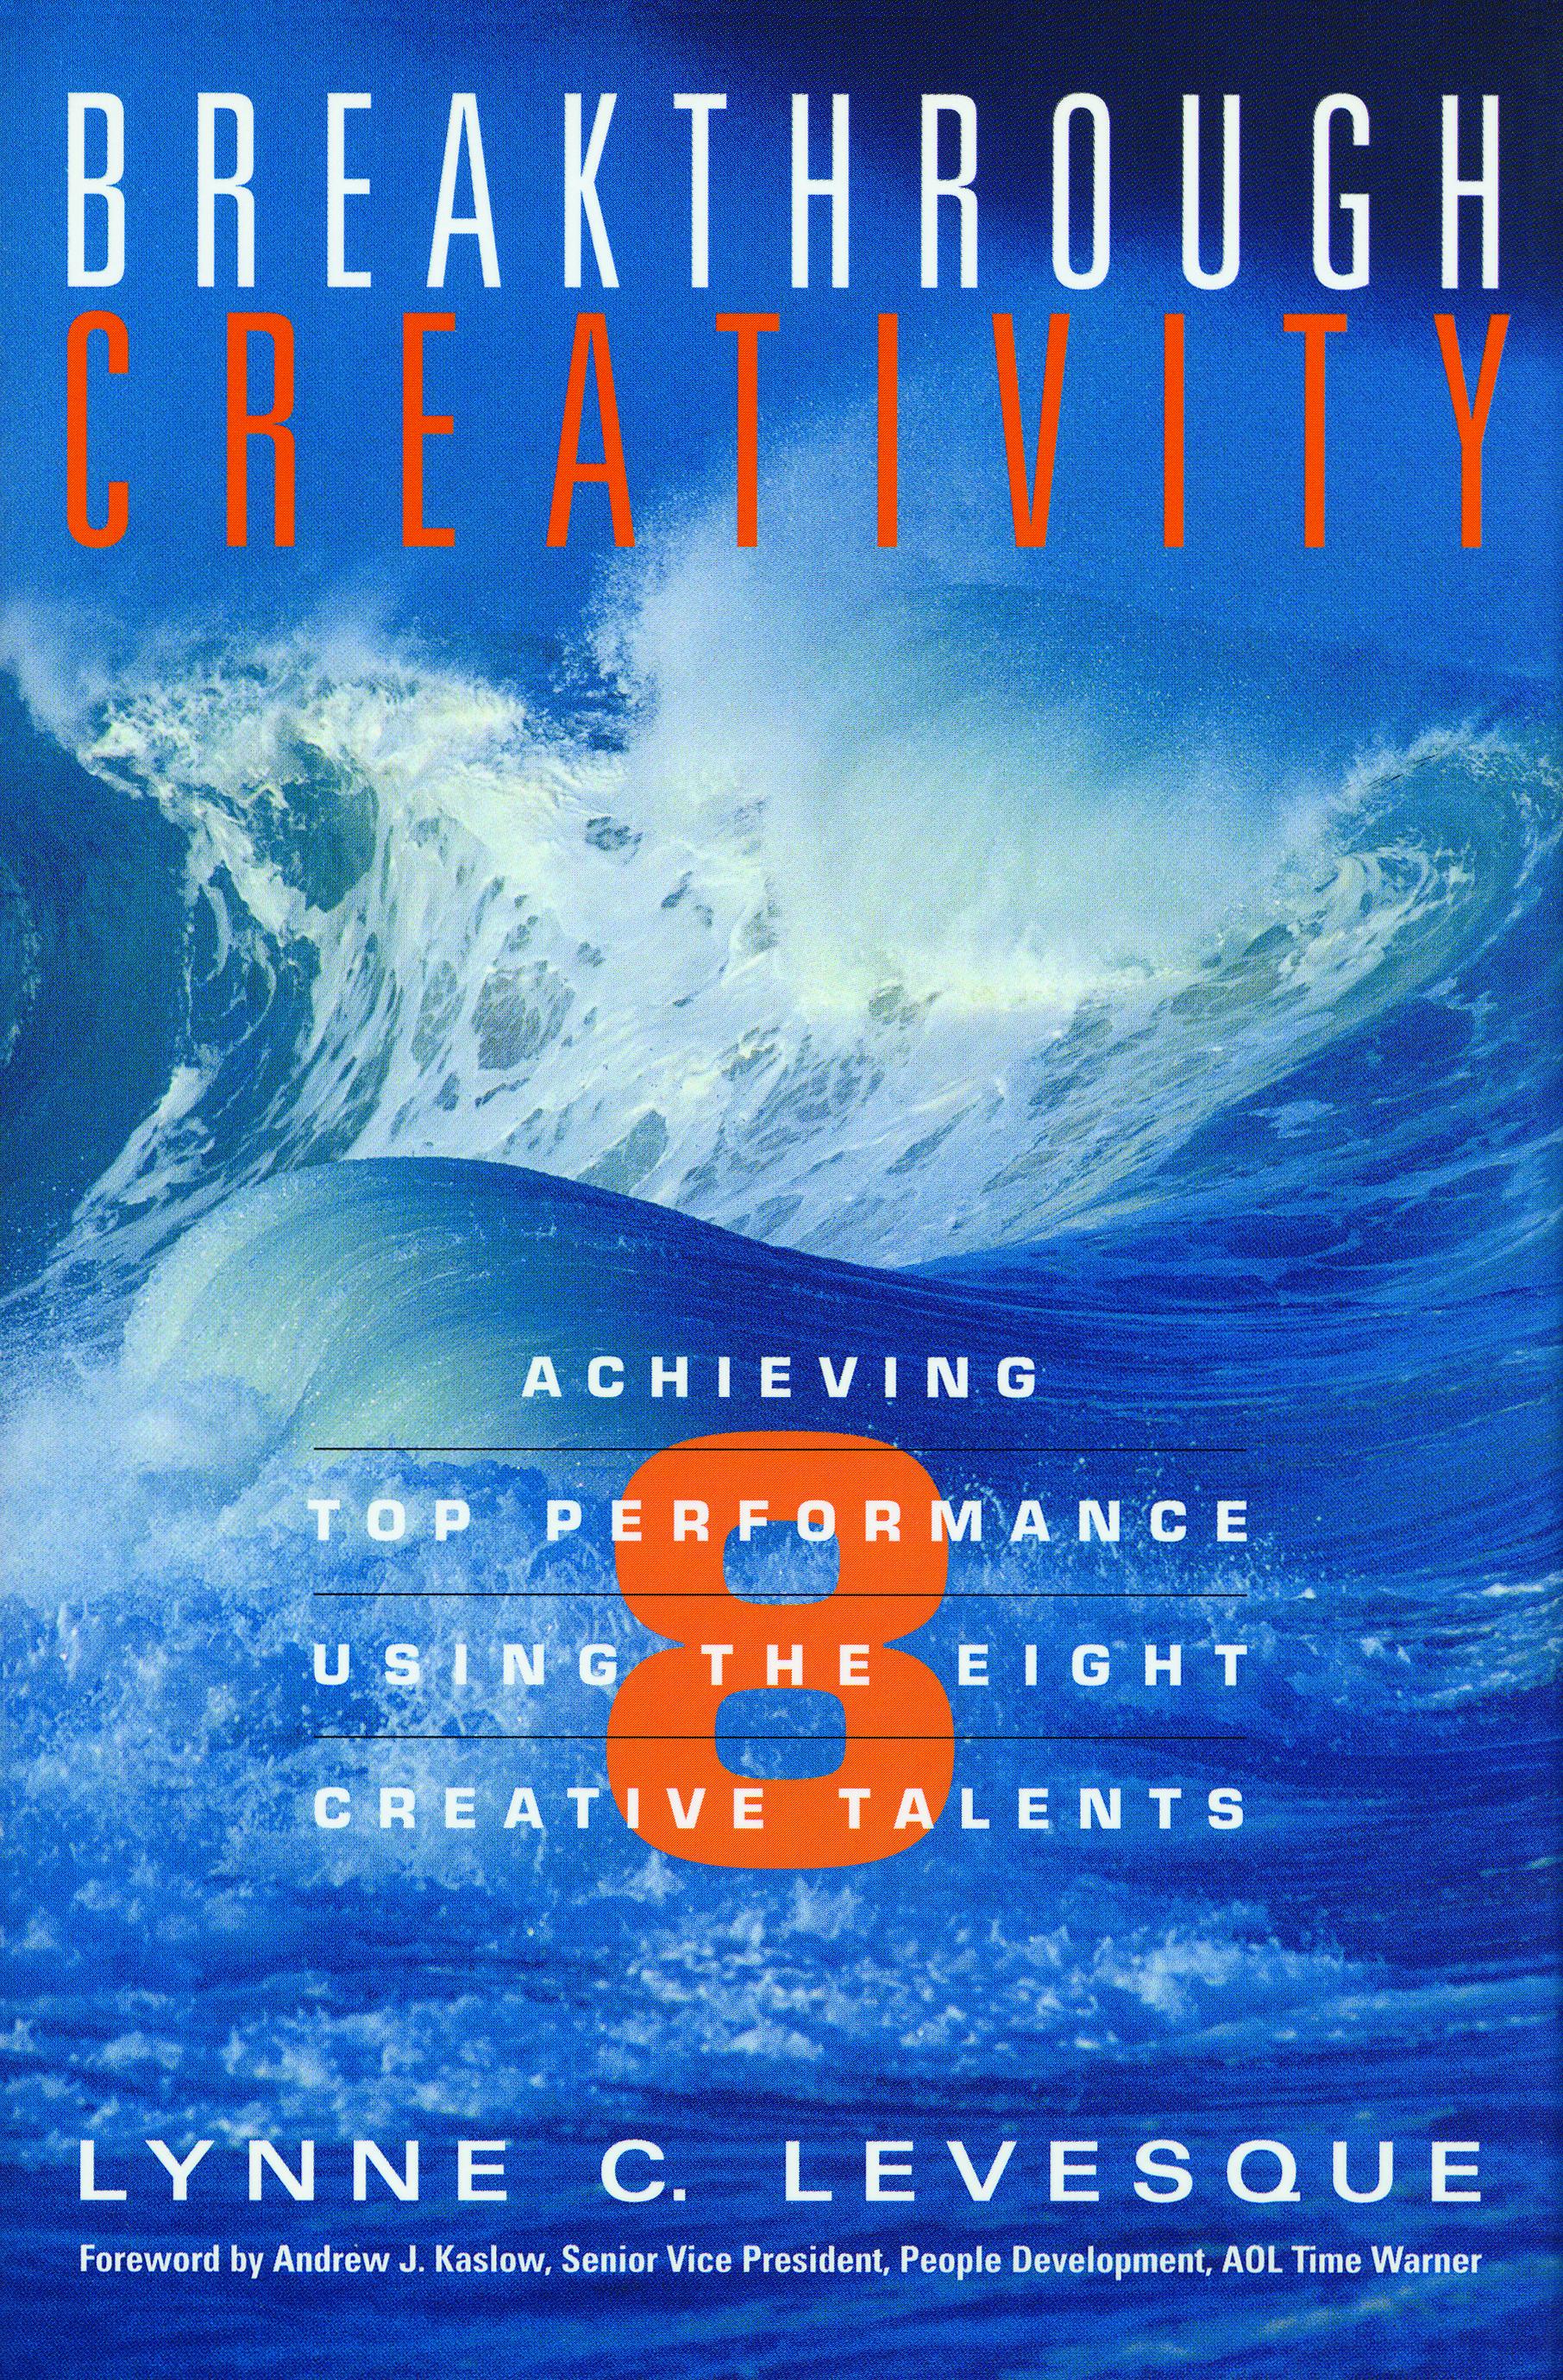 BreakthroughCreativity hi-res.jpg